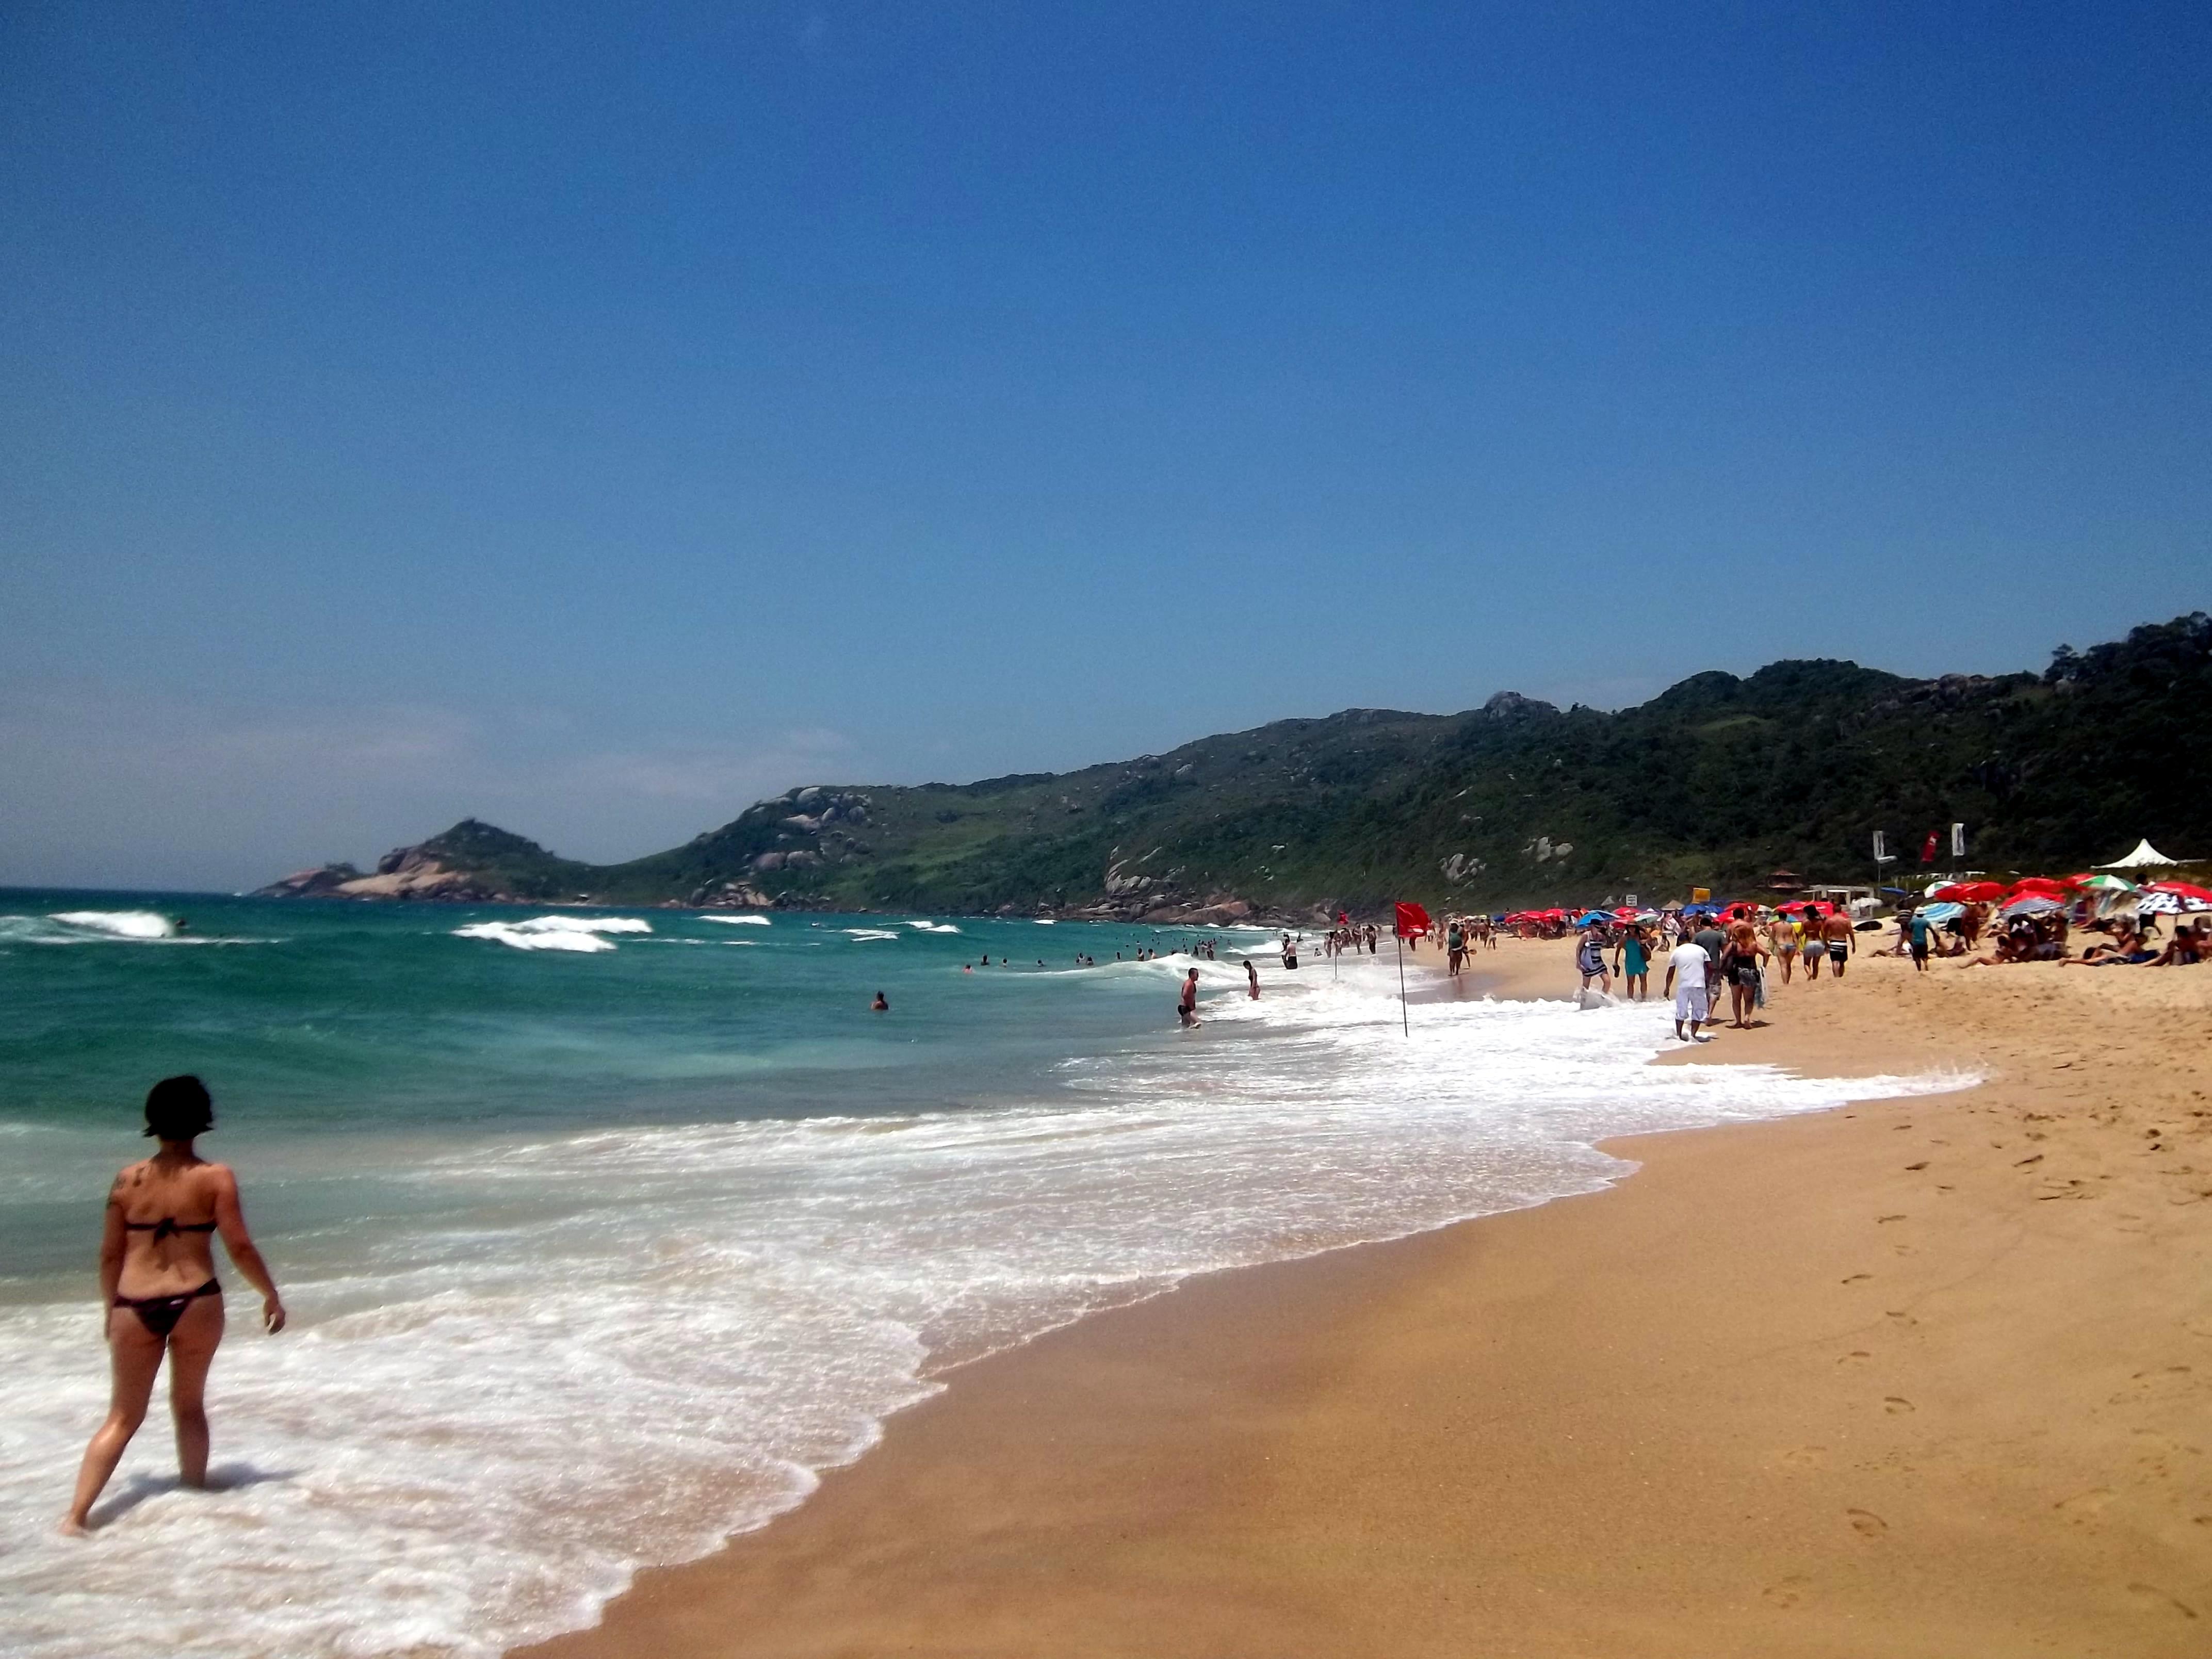 Ficheiro praia mole florianopolis brasil jpg for Paginas de nudismo